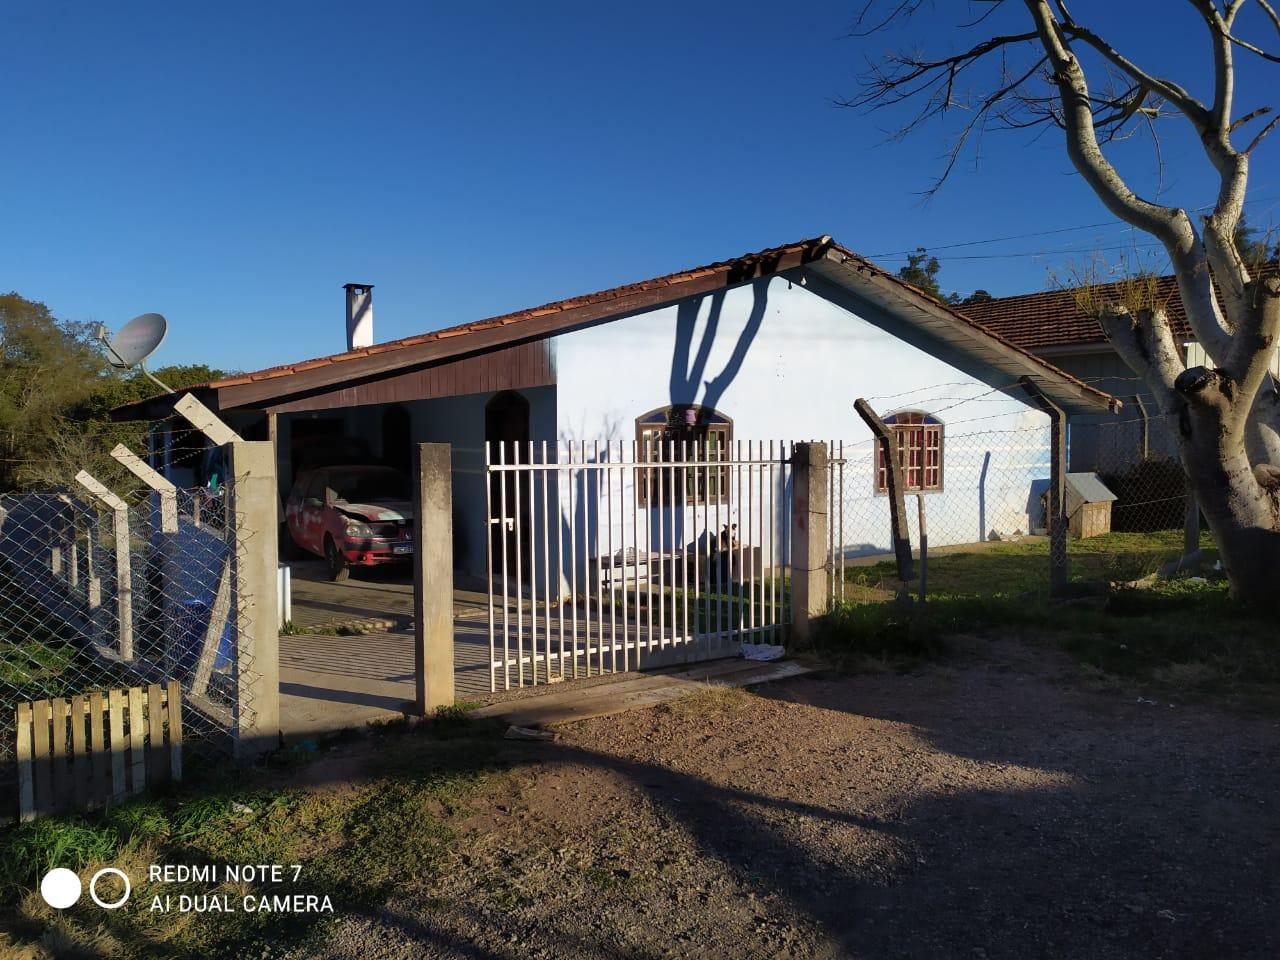 Residência para venda no bairro da Campina